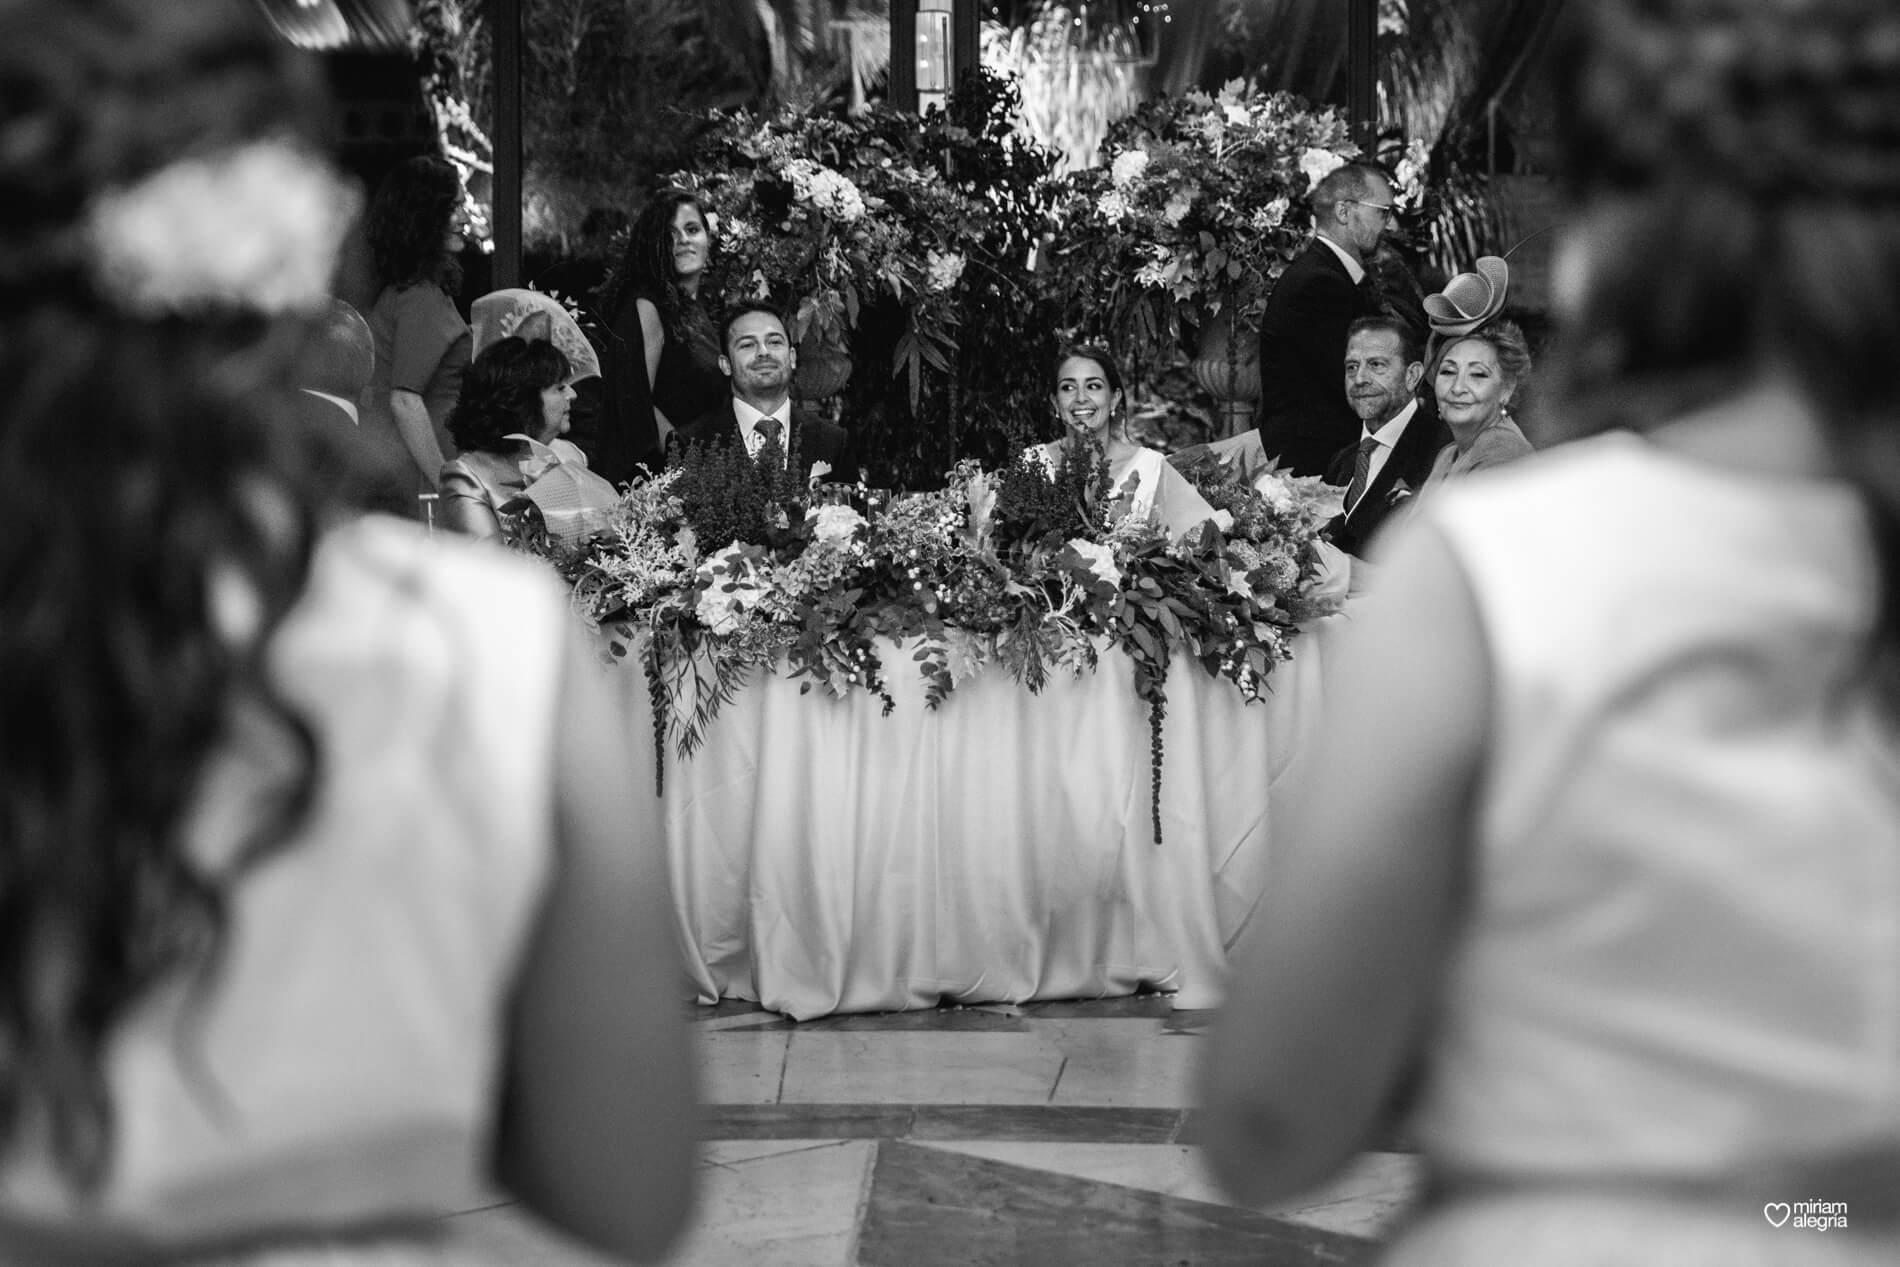 vestido-de-novia-paula-del-vas-miriam-alegria-fotografos-boda-murcia-142